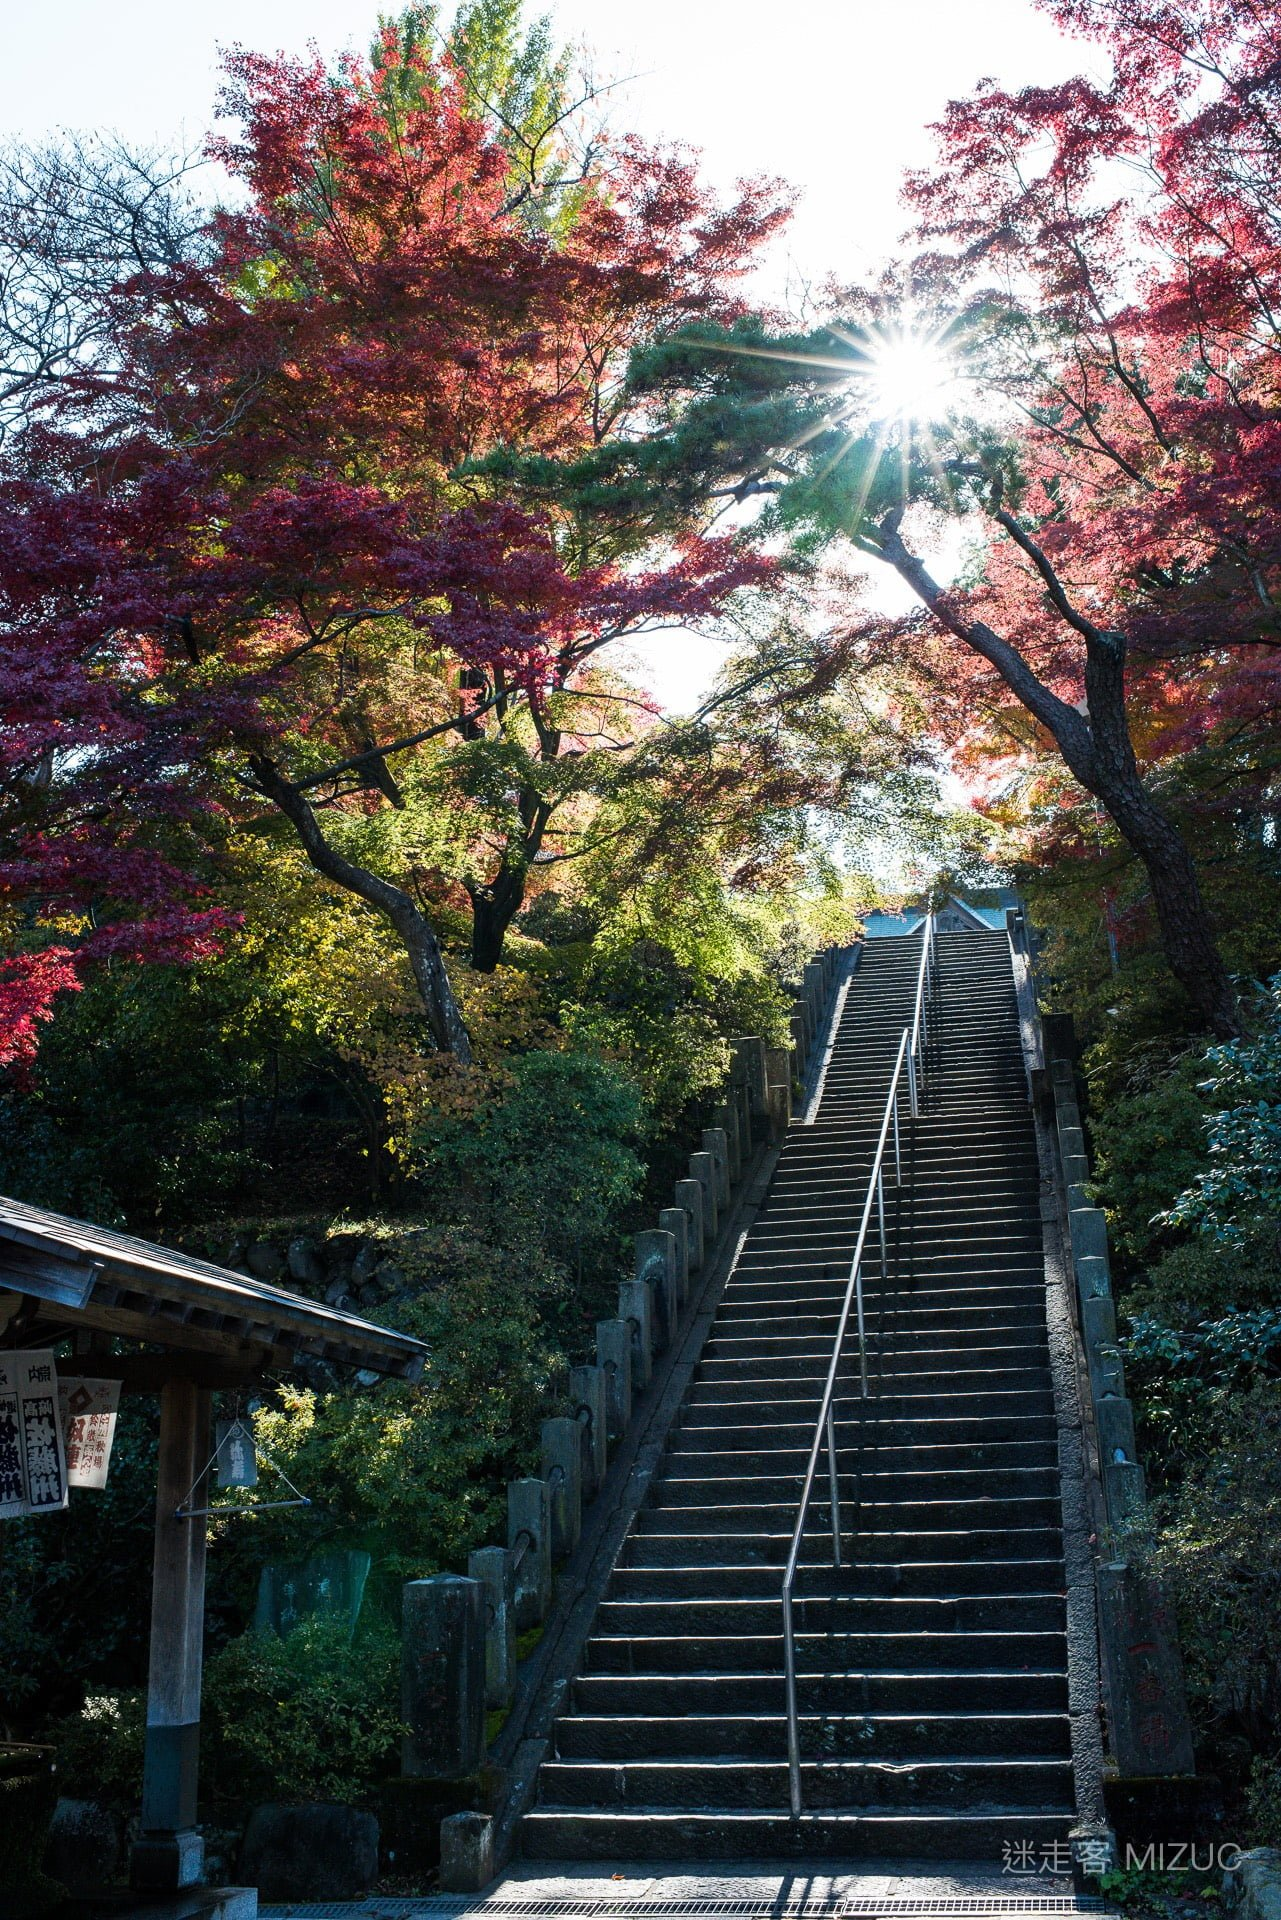 201711 Ibaraki Tochigi Gunma Japan Travel By RentalCar 83 日本自駕旅遊/北關東三縣「茨城、櫪木、群馬」秋天美食、溫泉與瀑布秘境百景(精選照片分享)